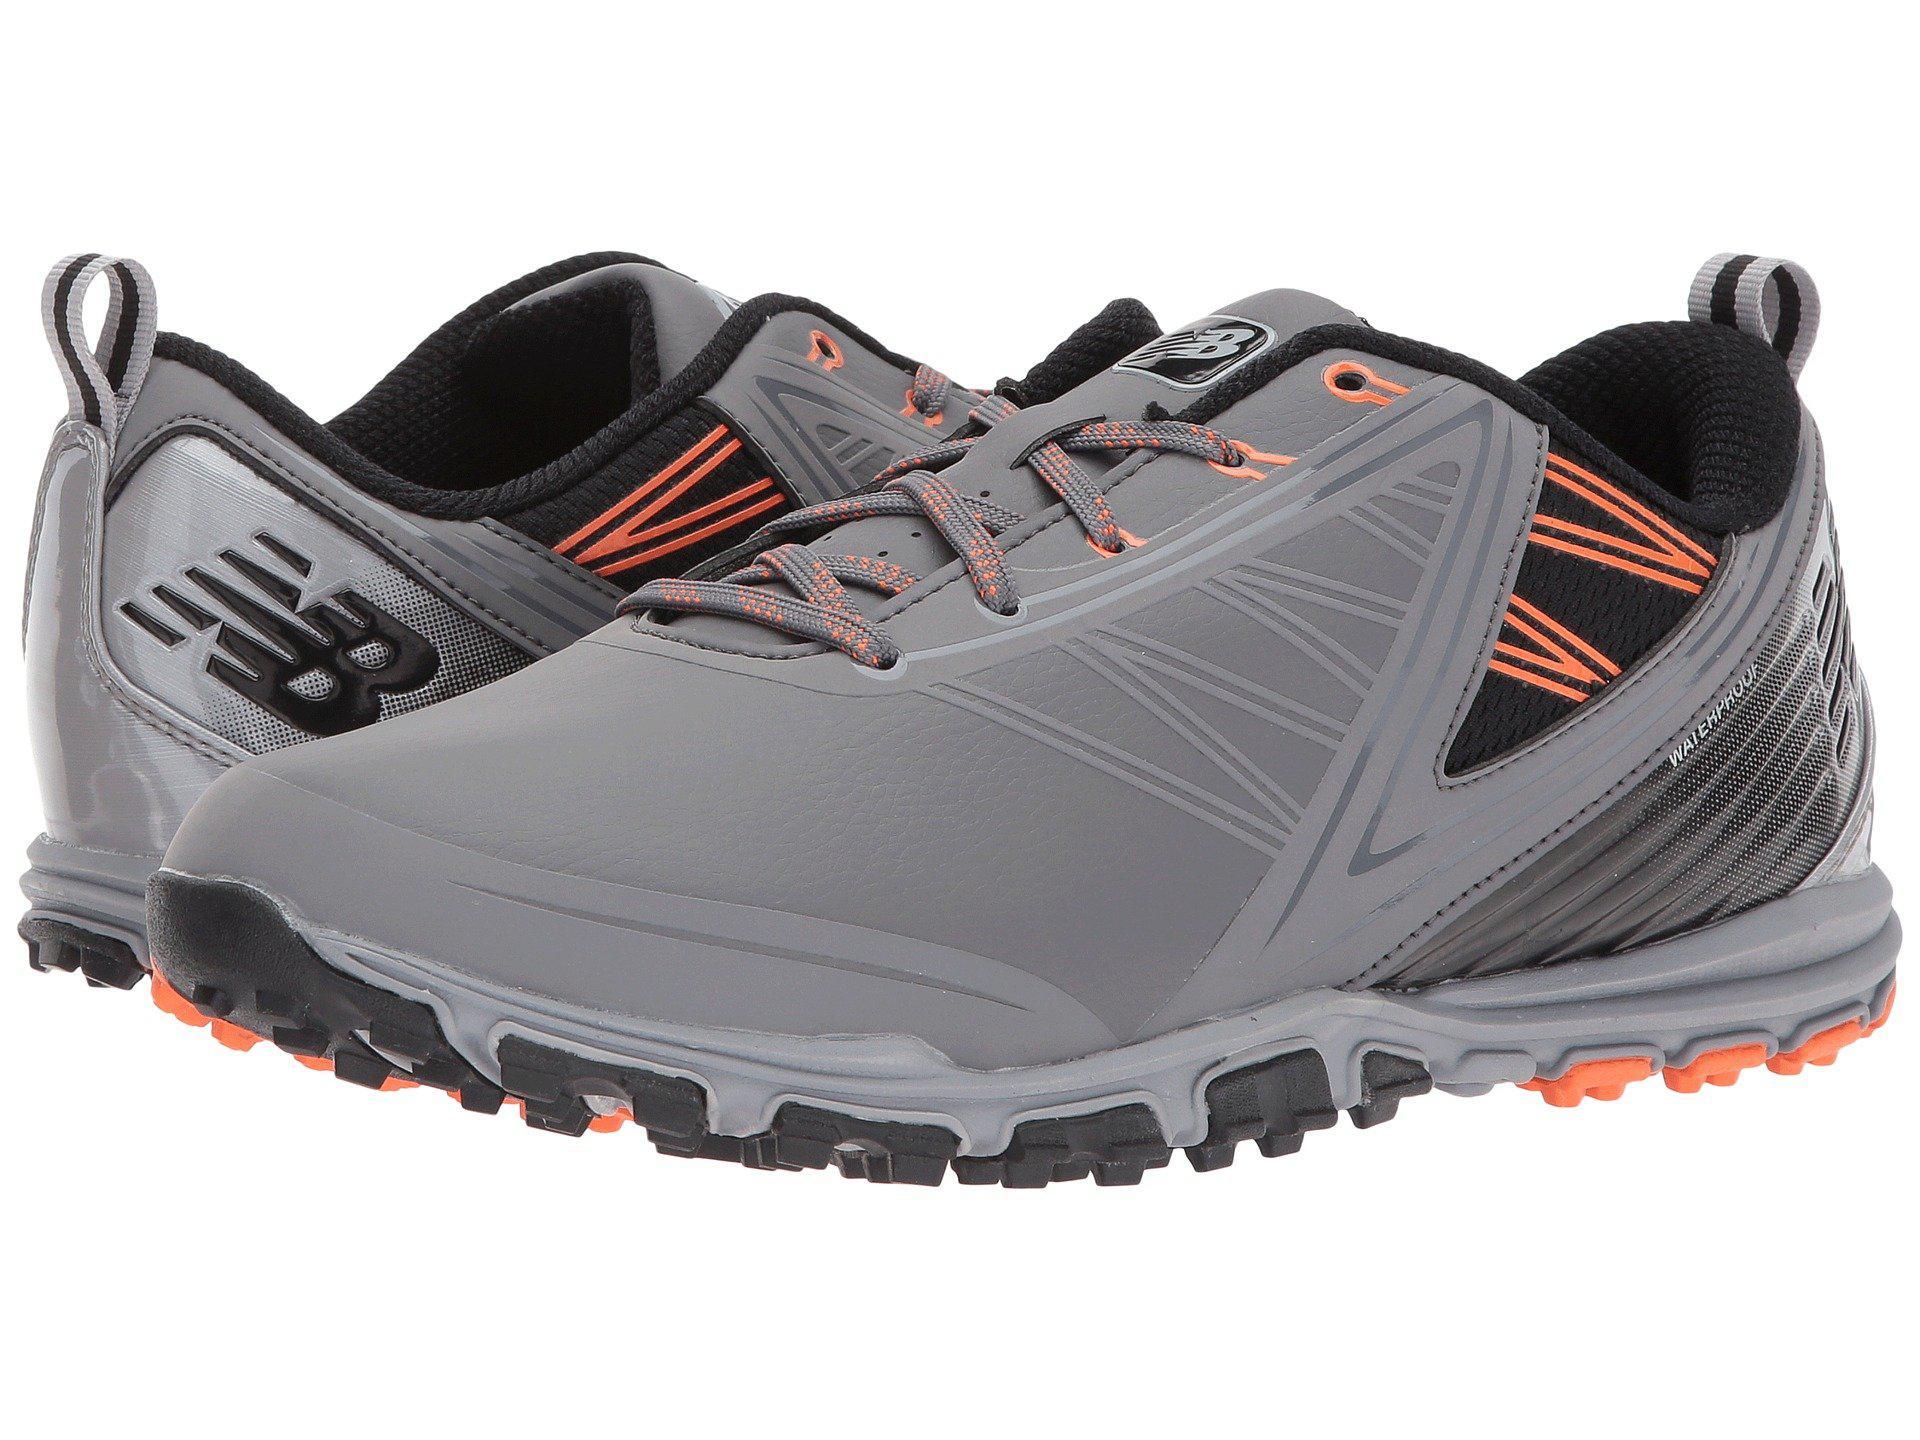 073ca4124c8a2 Lyst - New Balance Nbg1006 Minimus Sl (white/black) Men's Golf Shoes ...